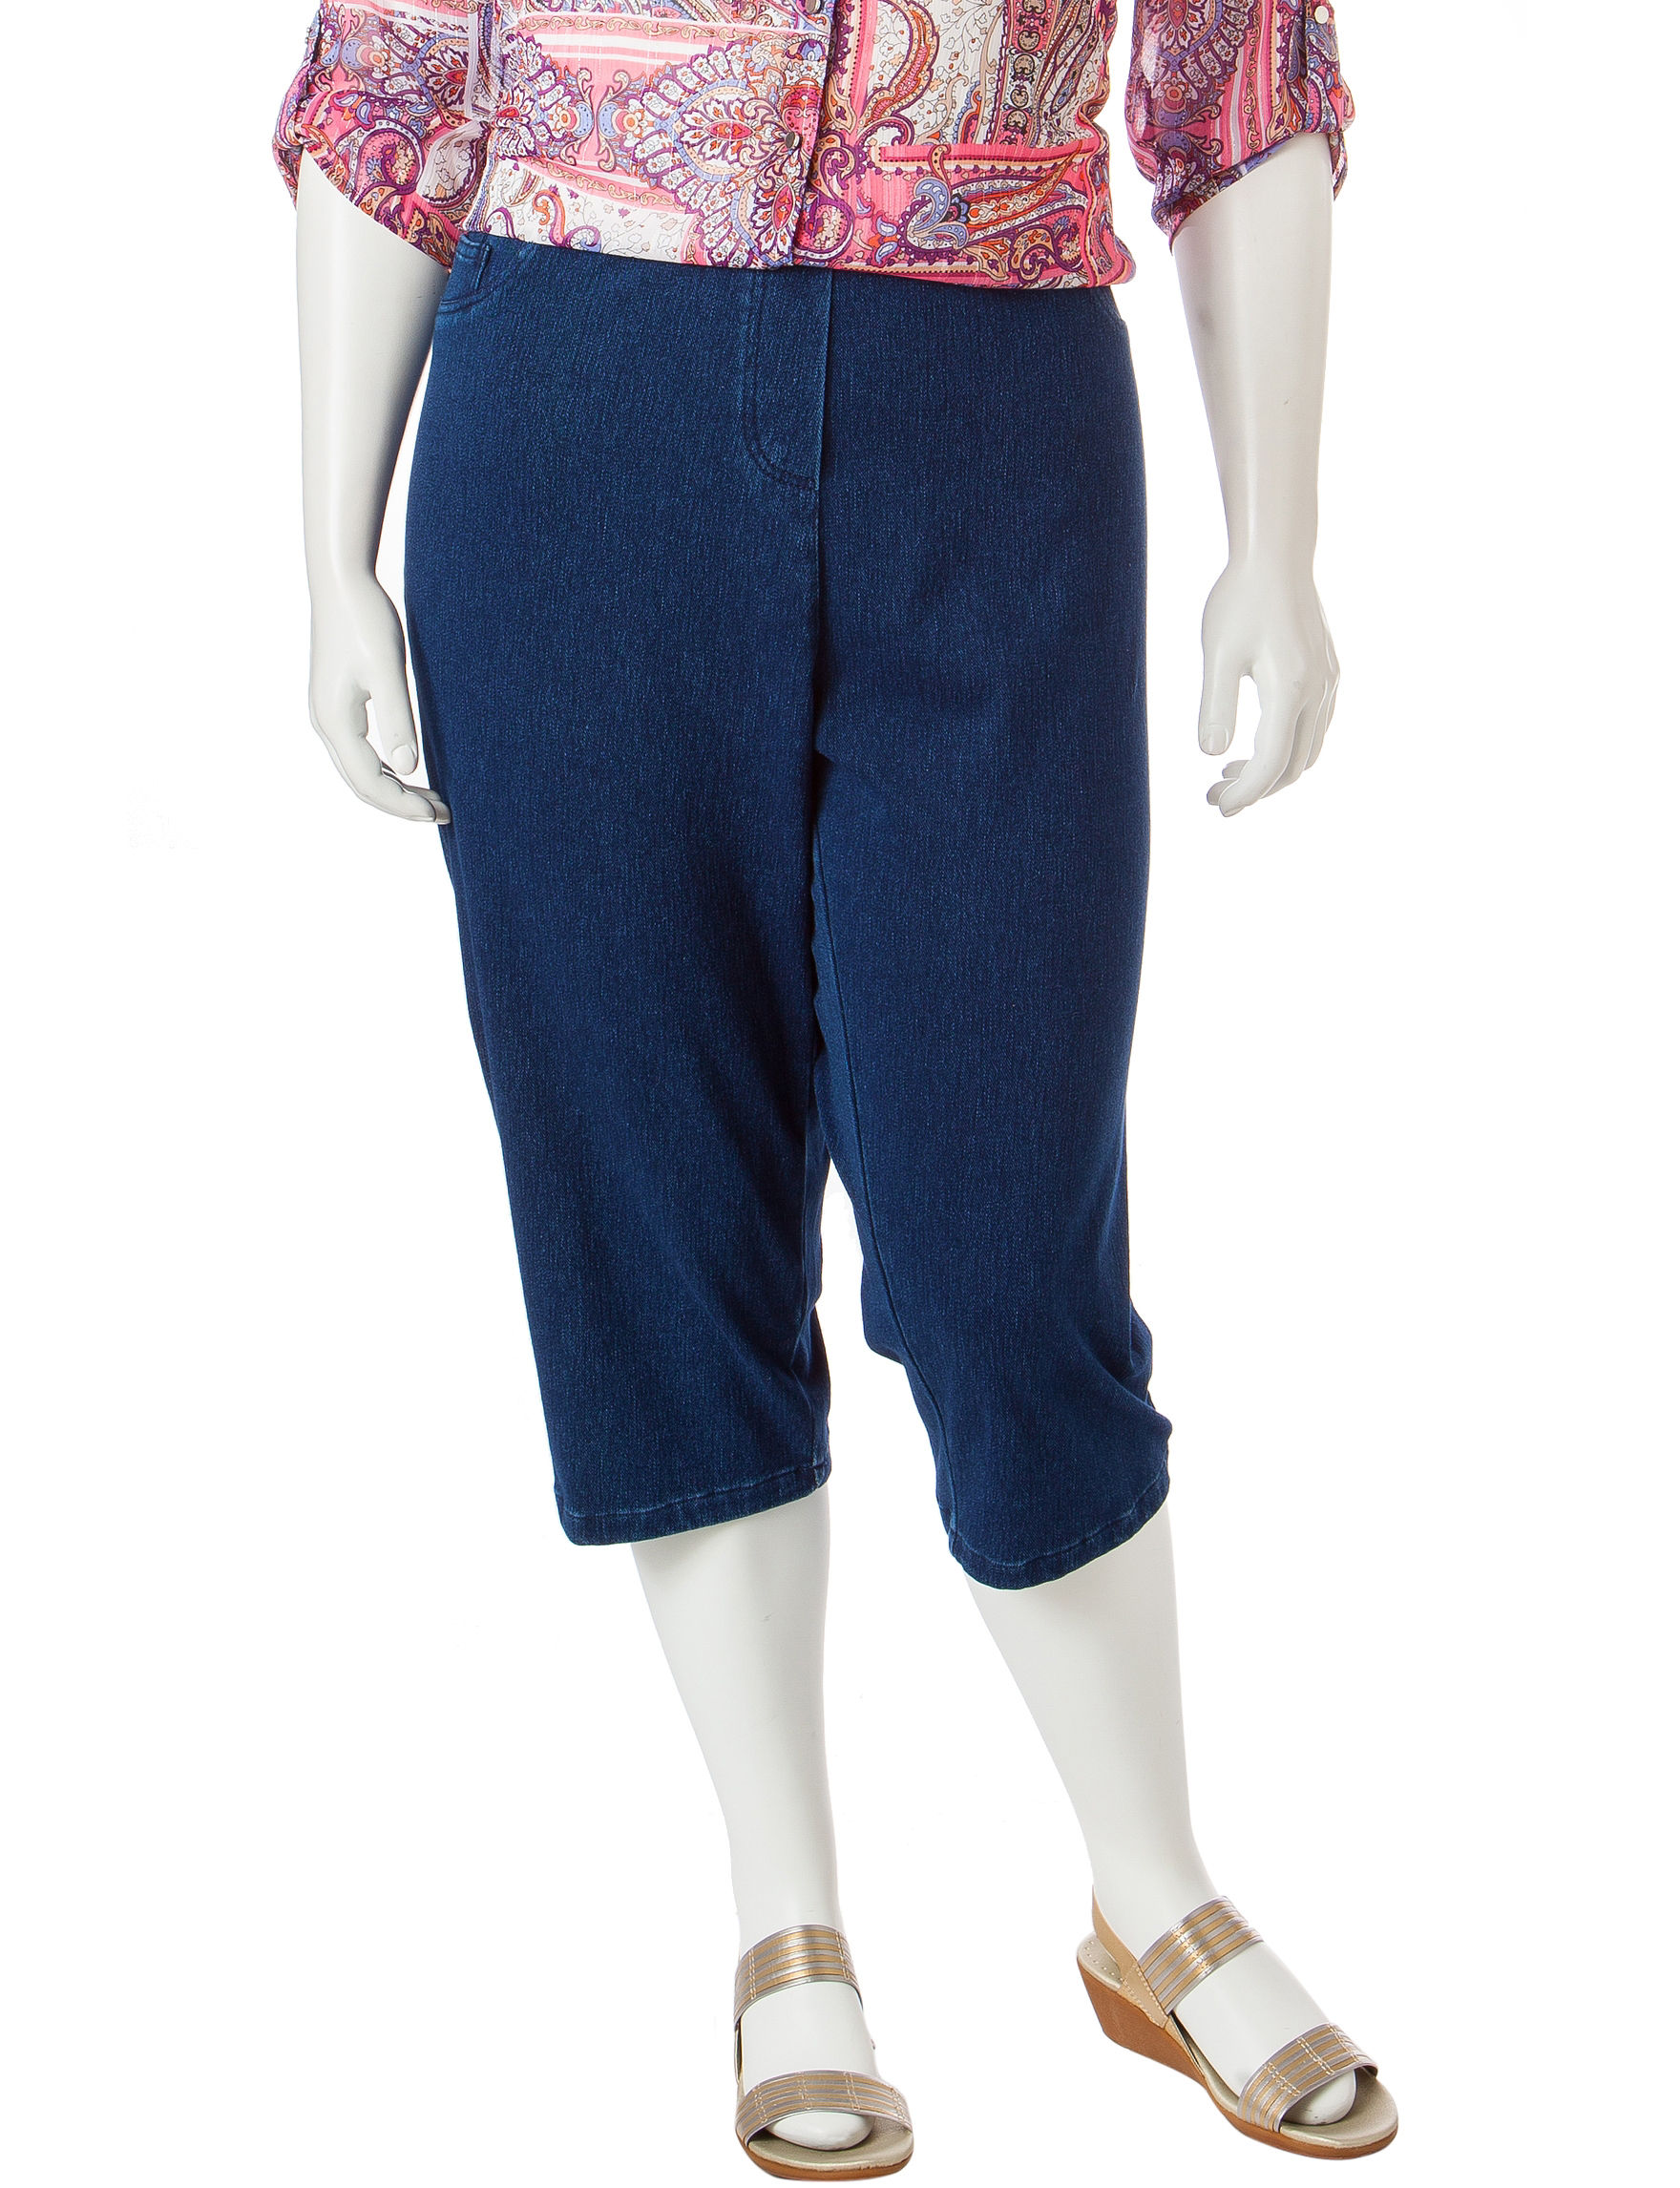 2f3fcf4e226 UPC 712439071888 product image for Cathy Daniels Plus-size Pull On Knit Denim  Capris ...